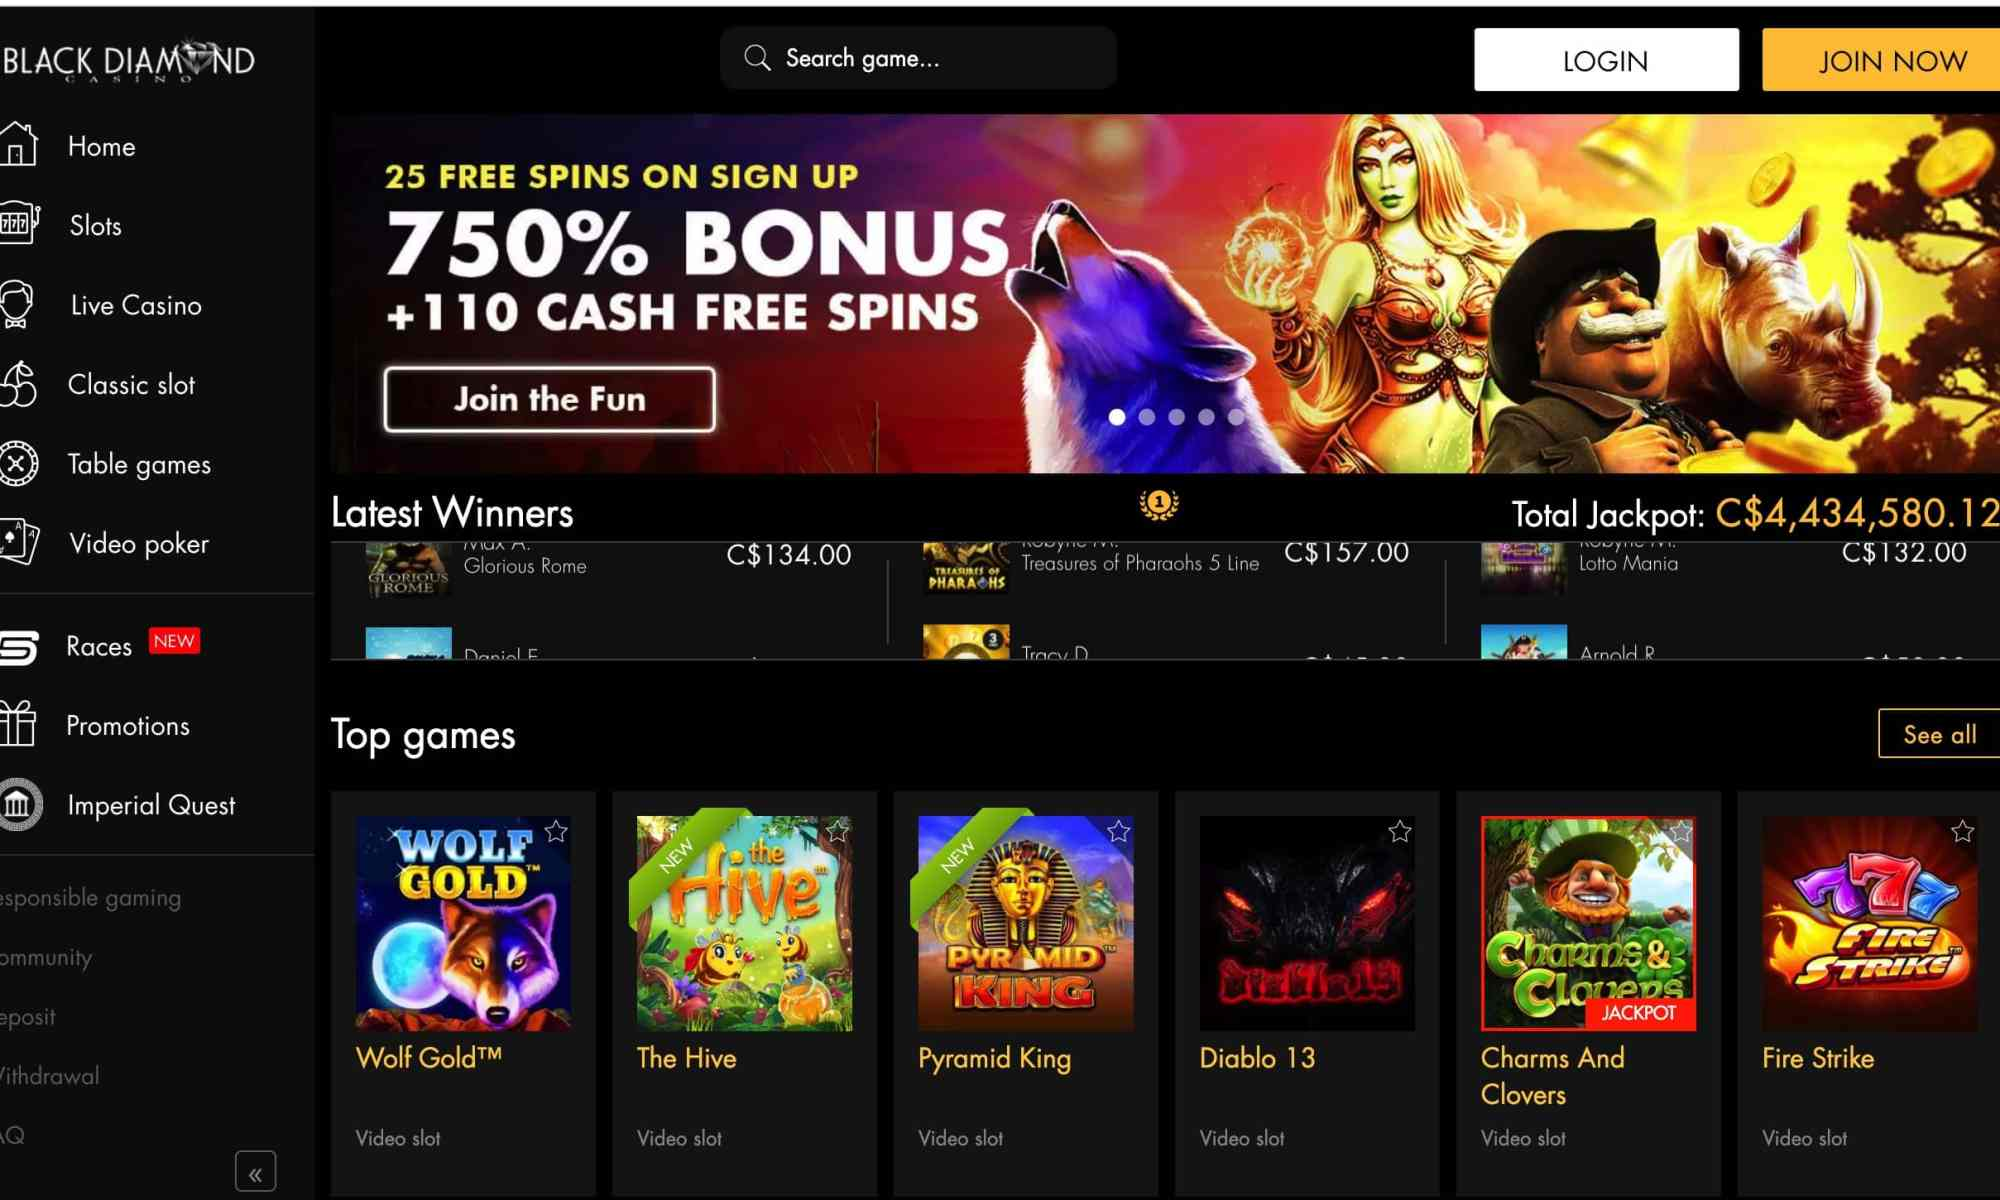 Black Diamond Casino - Get 675% Deposit Bonus + 25 Free Spins